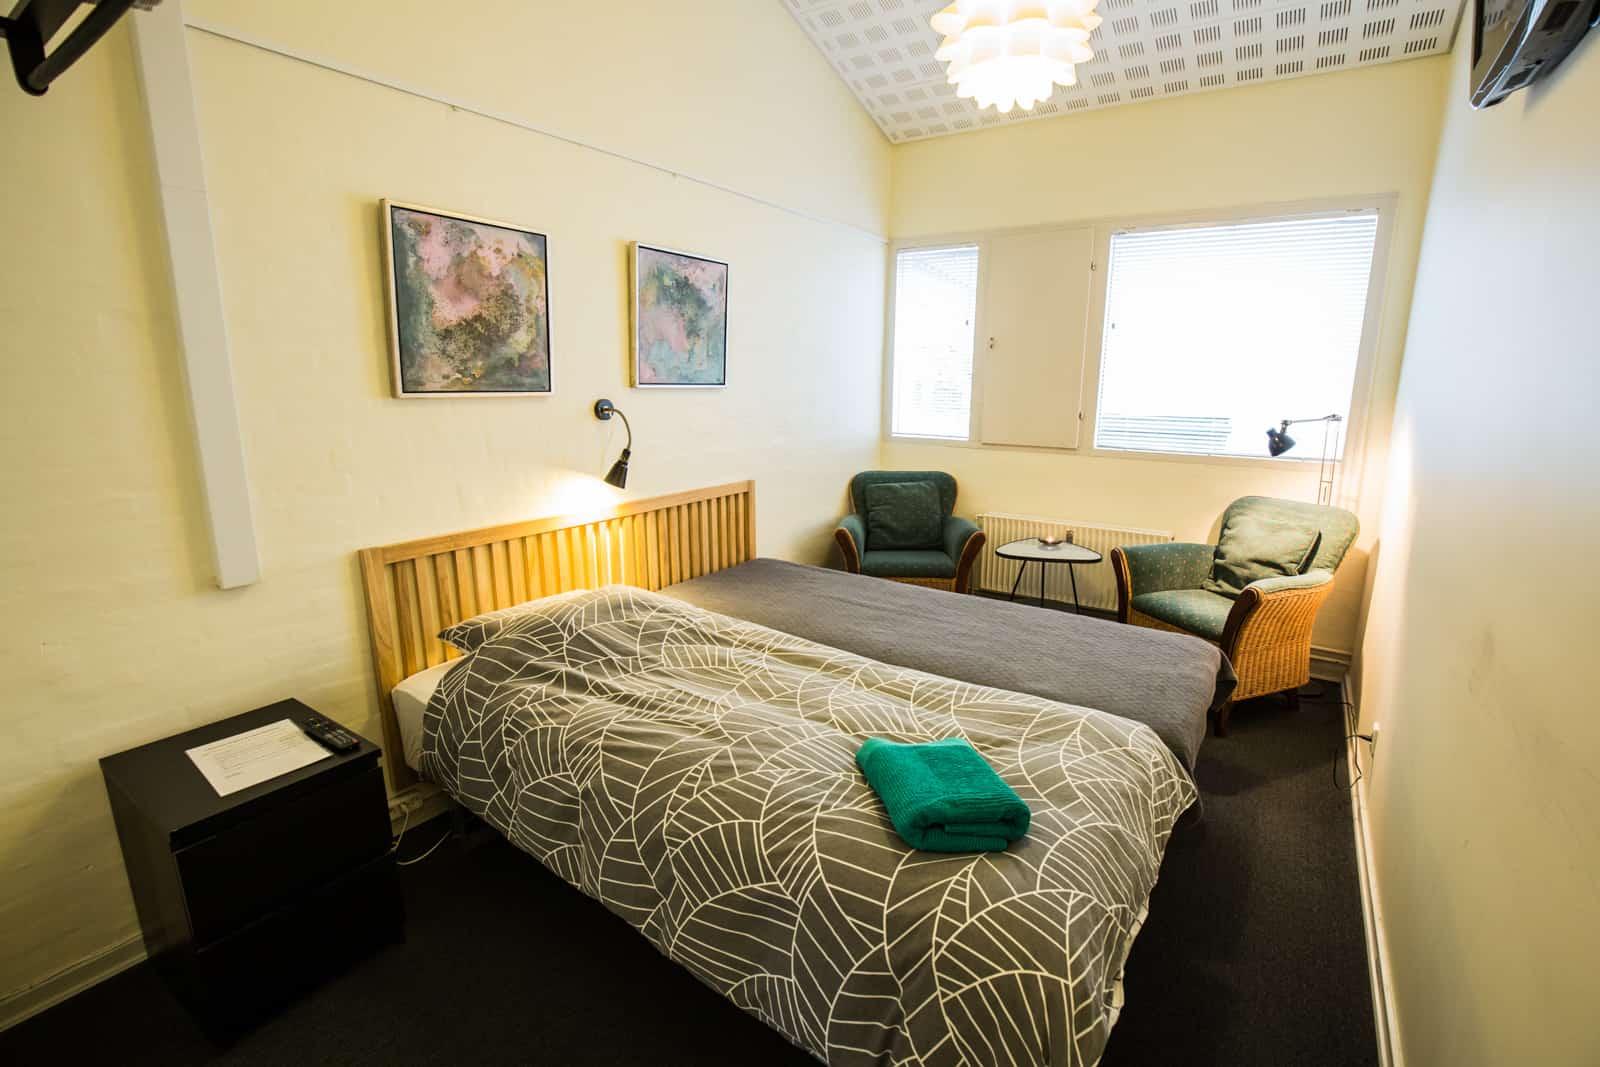 Bed and Breakfast Holstebro overblik